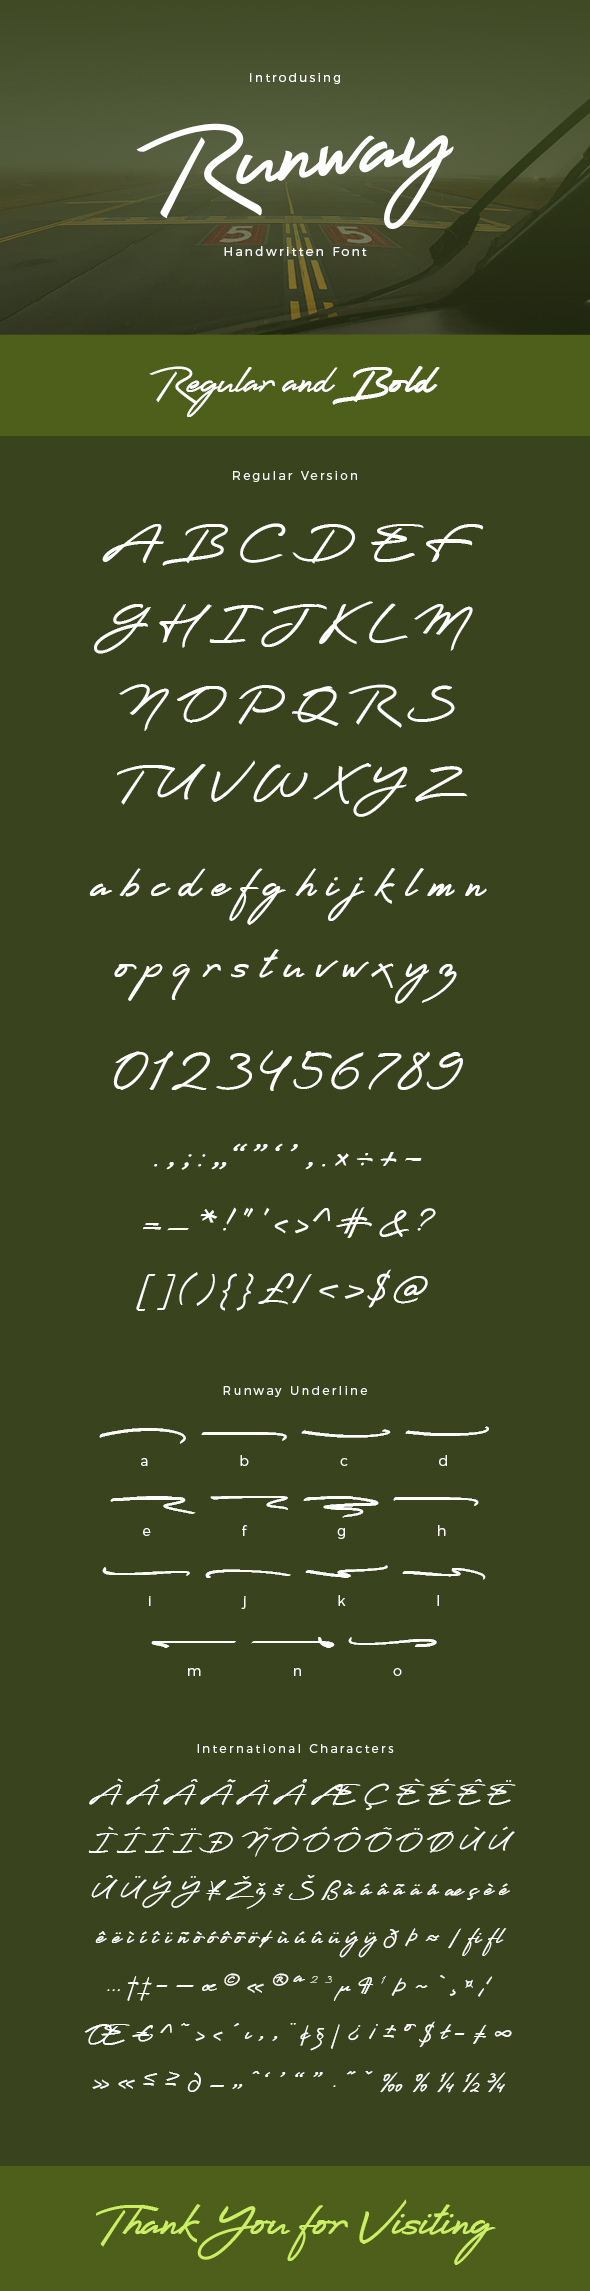 Free Font Runway Handwritten Font Download